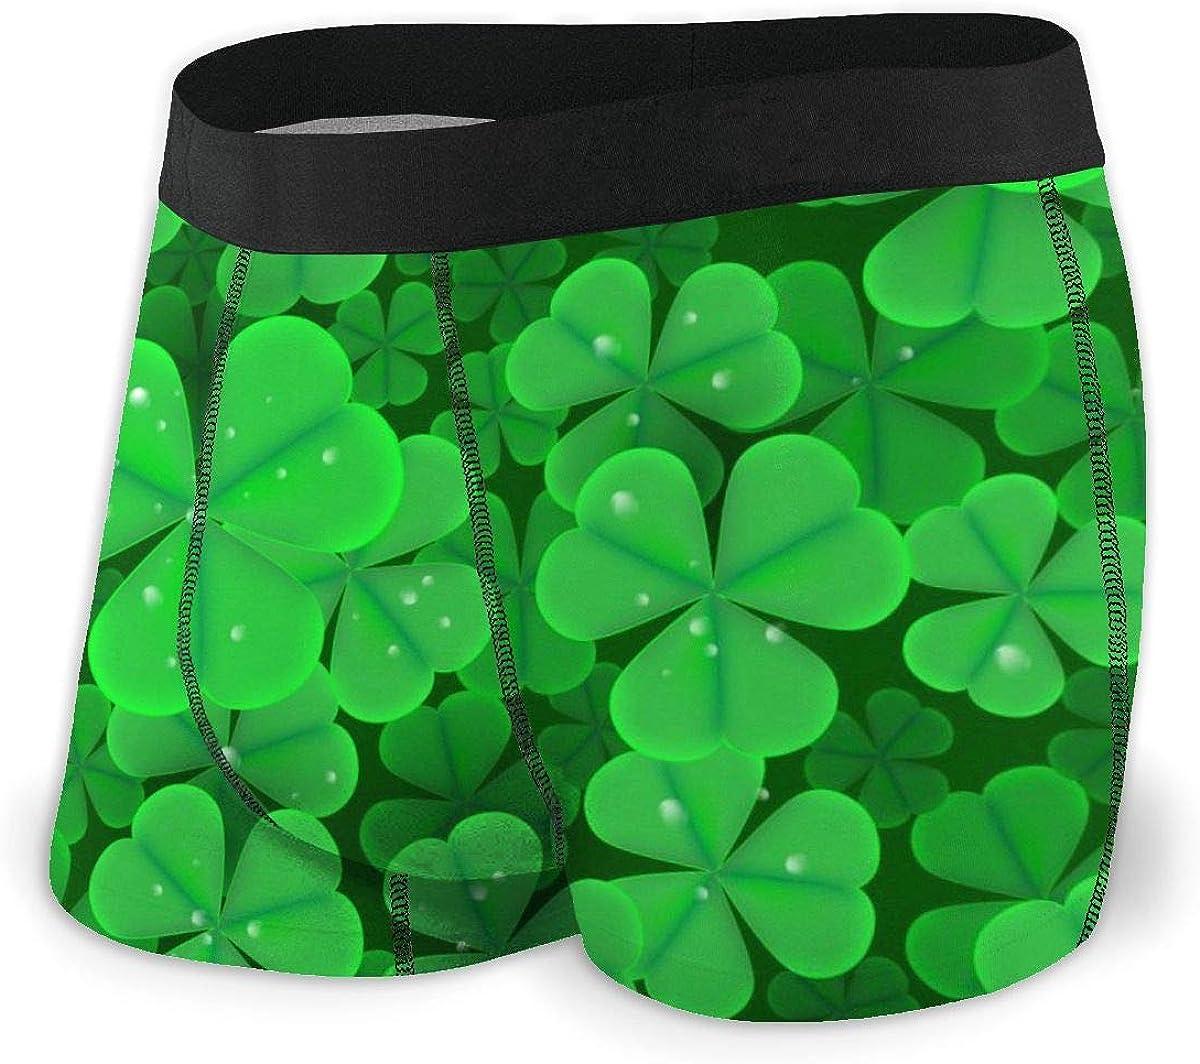 Mens Boxer Briefs St. Patrick's Day Clover Boys Trunks Underwear Short Leg Breathable Man